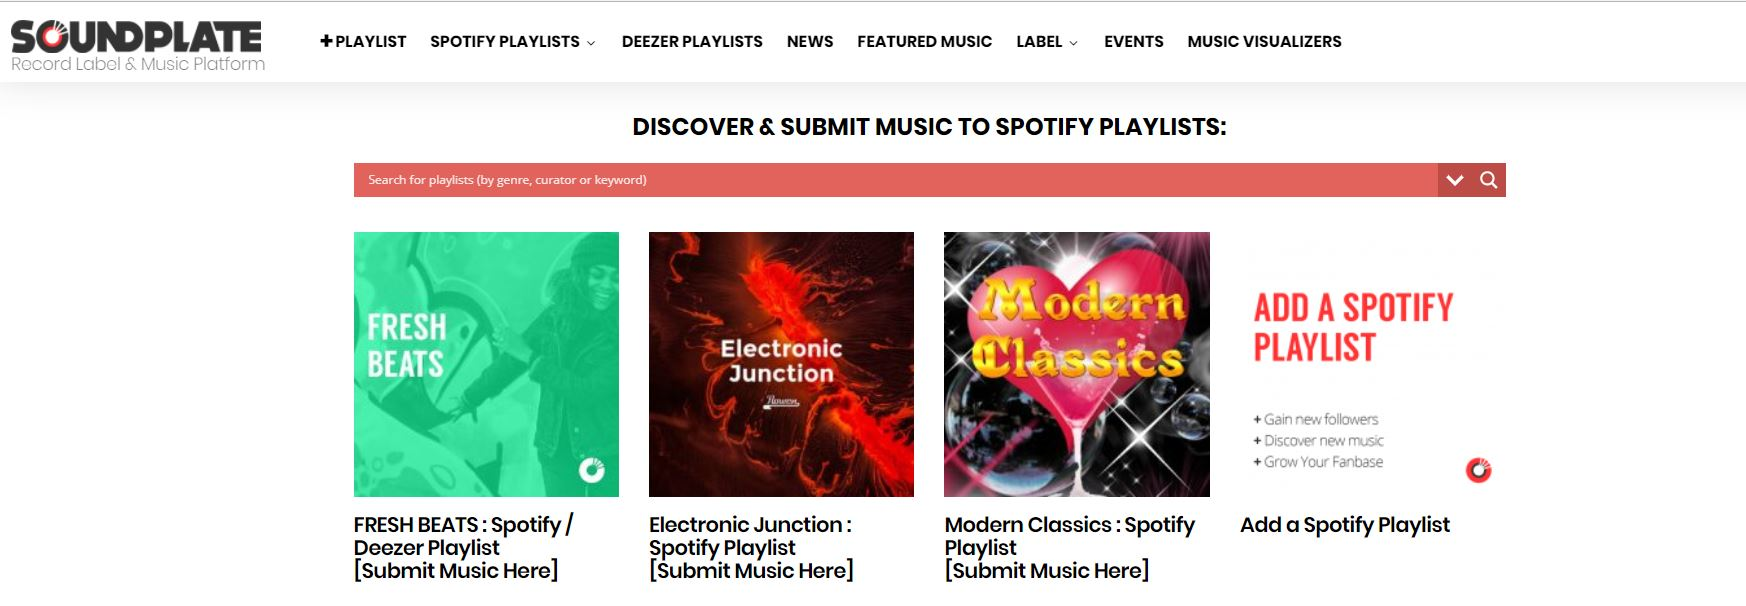 colocar musica no spotify